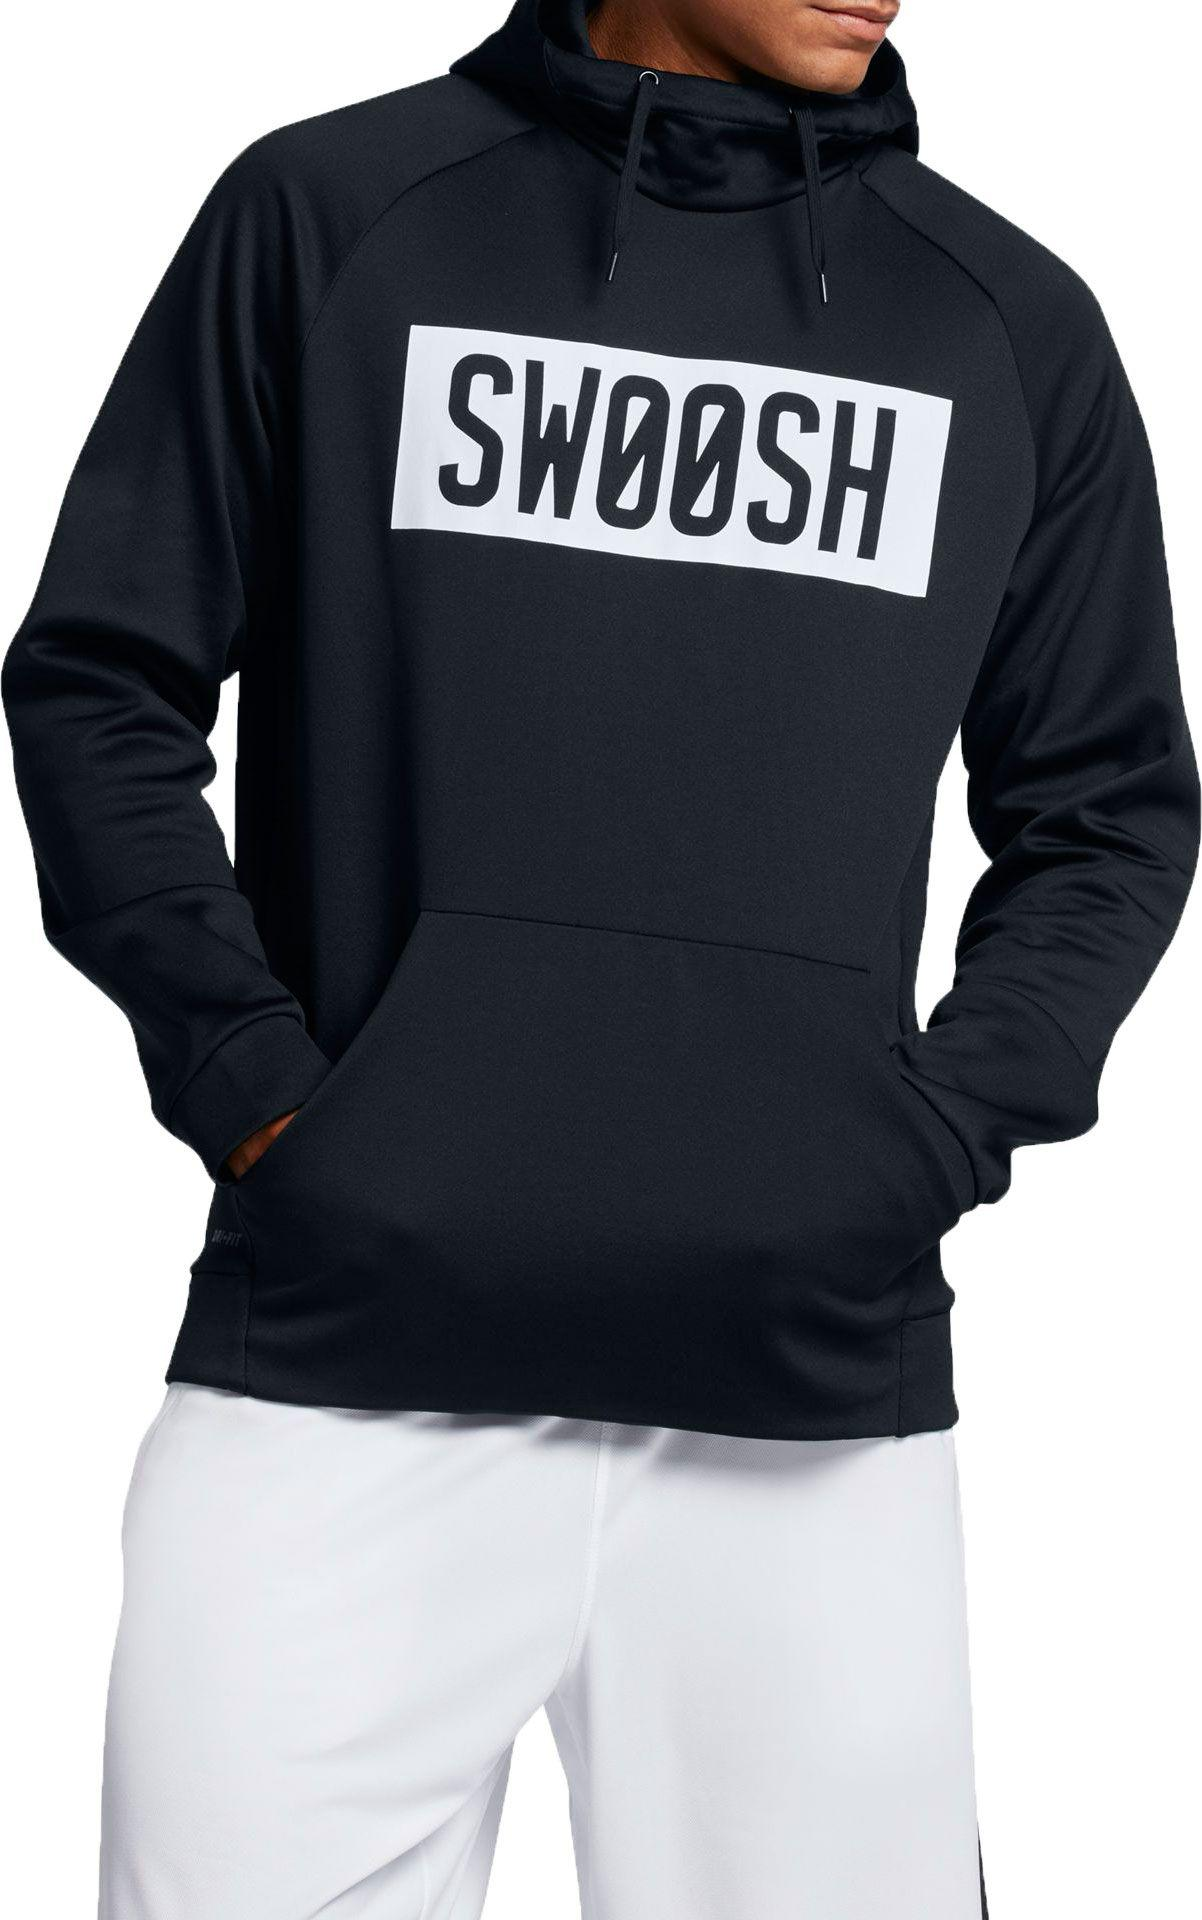 5c7375d4c9 Lyst - Nike Therma Bar Swoosh Hoodie in Black for Men